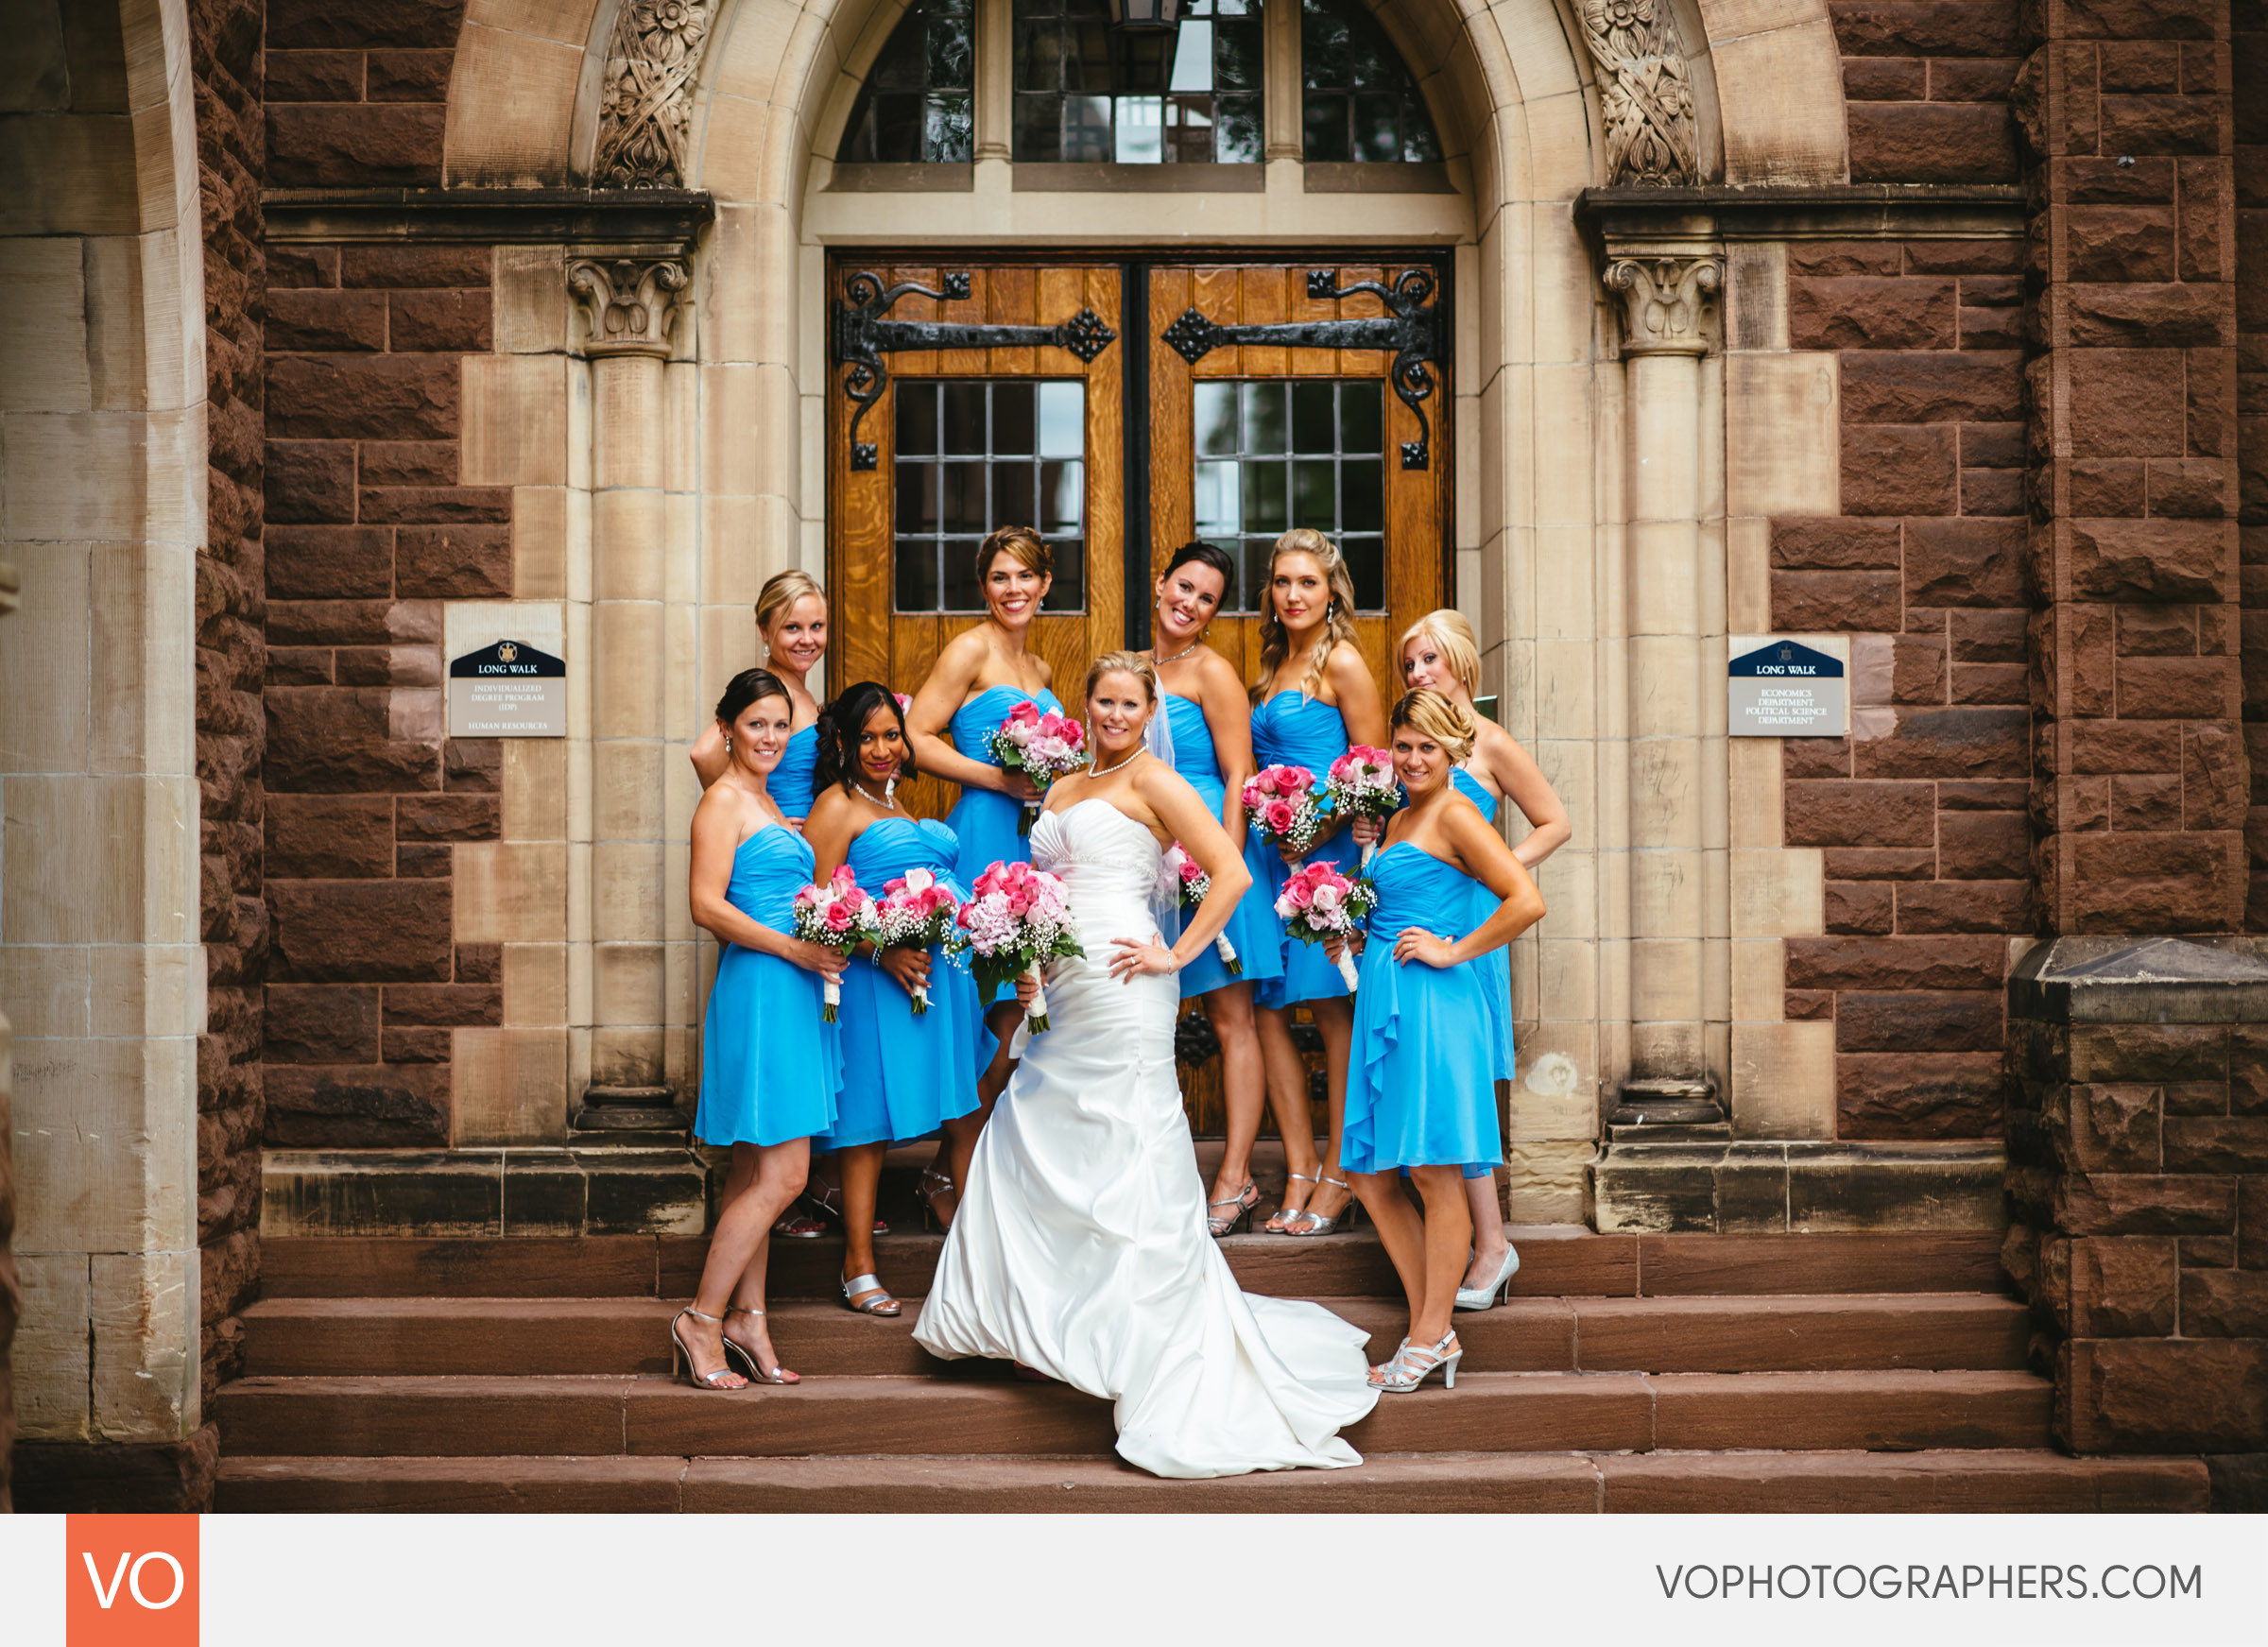 Doubletree-Hotel-Bristol-Wedding-Cathy-Chris-0018